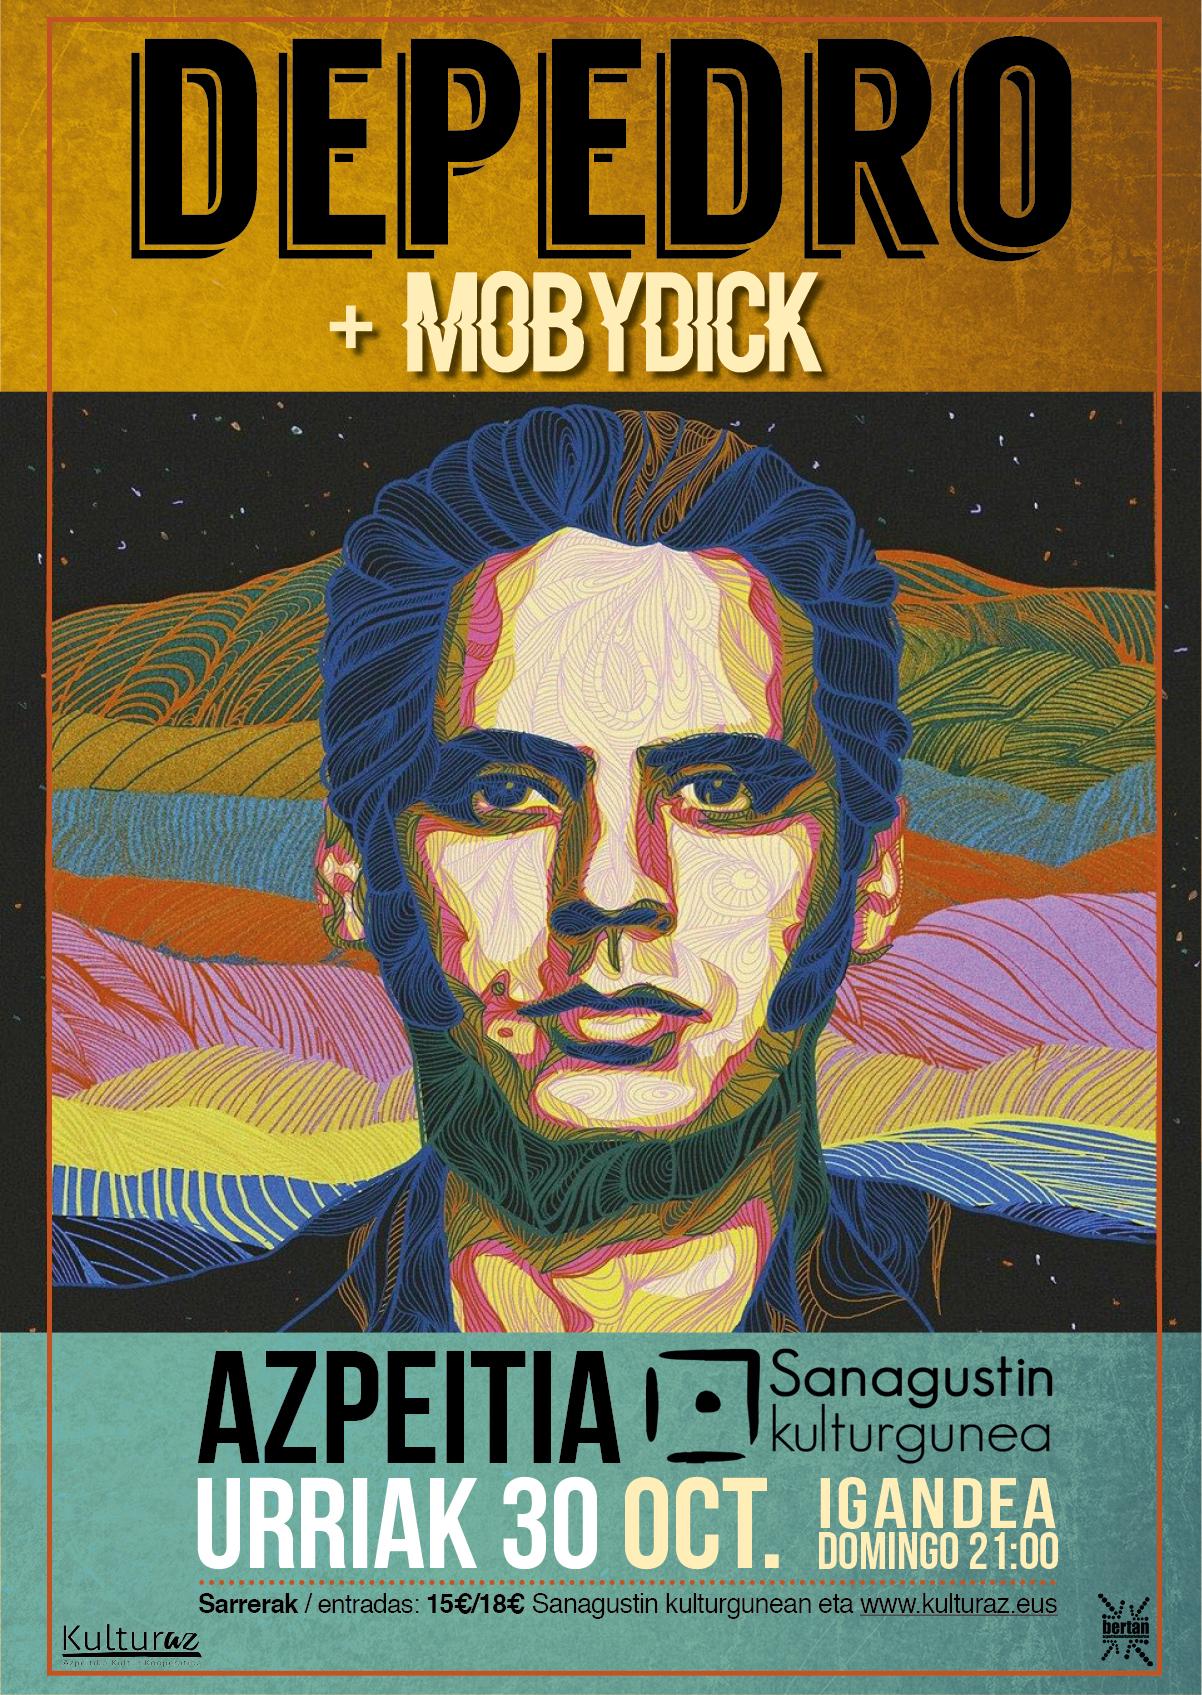 Depedro + Mobydick